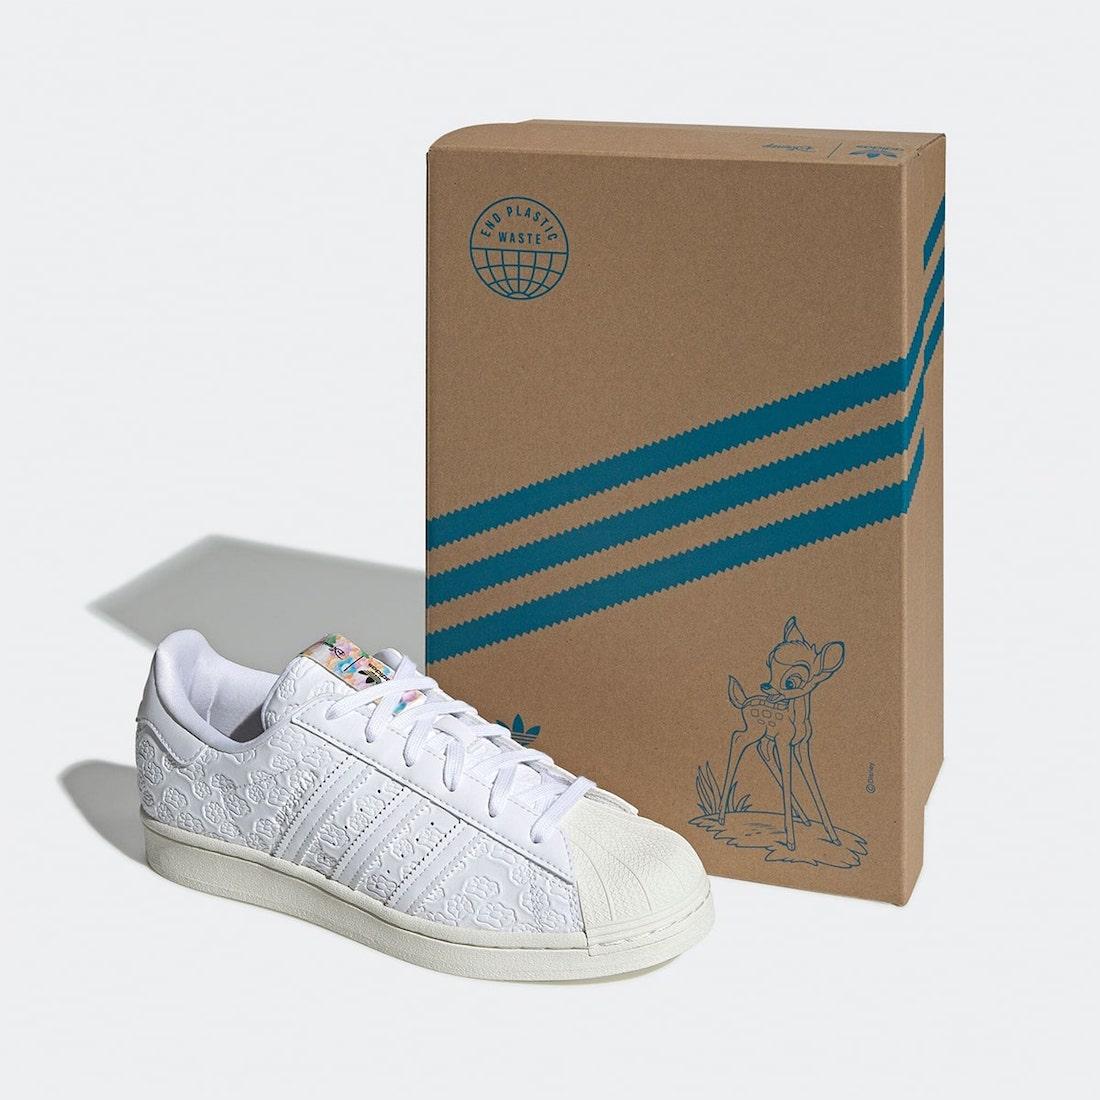 联名, 做旧, Superstar, adidas Superstar, Adidas